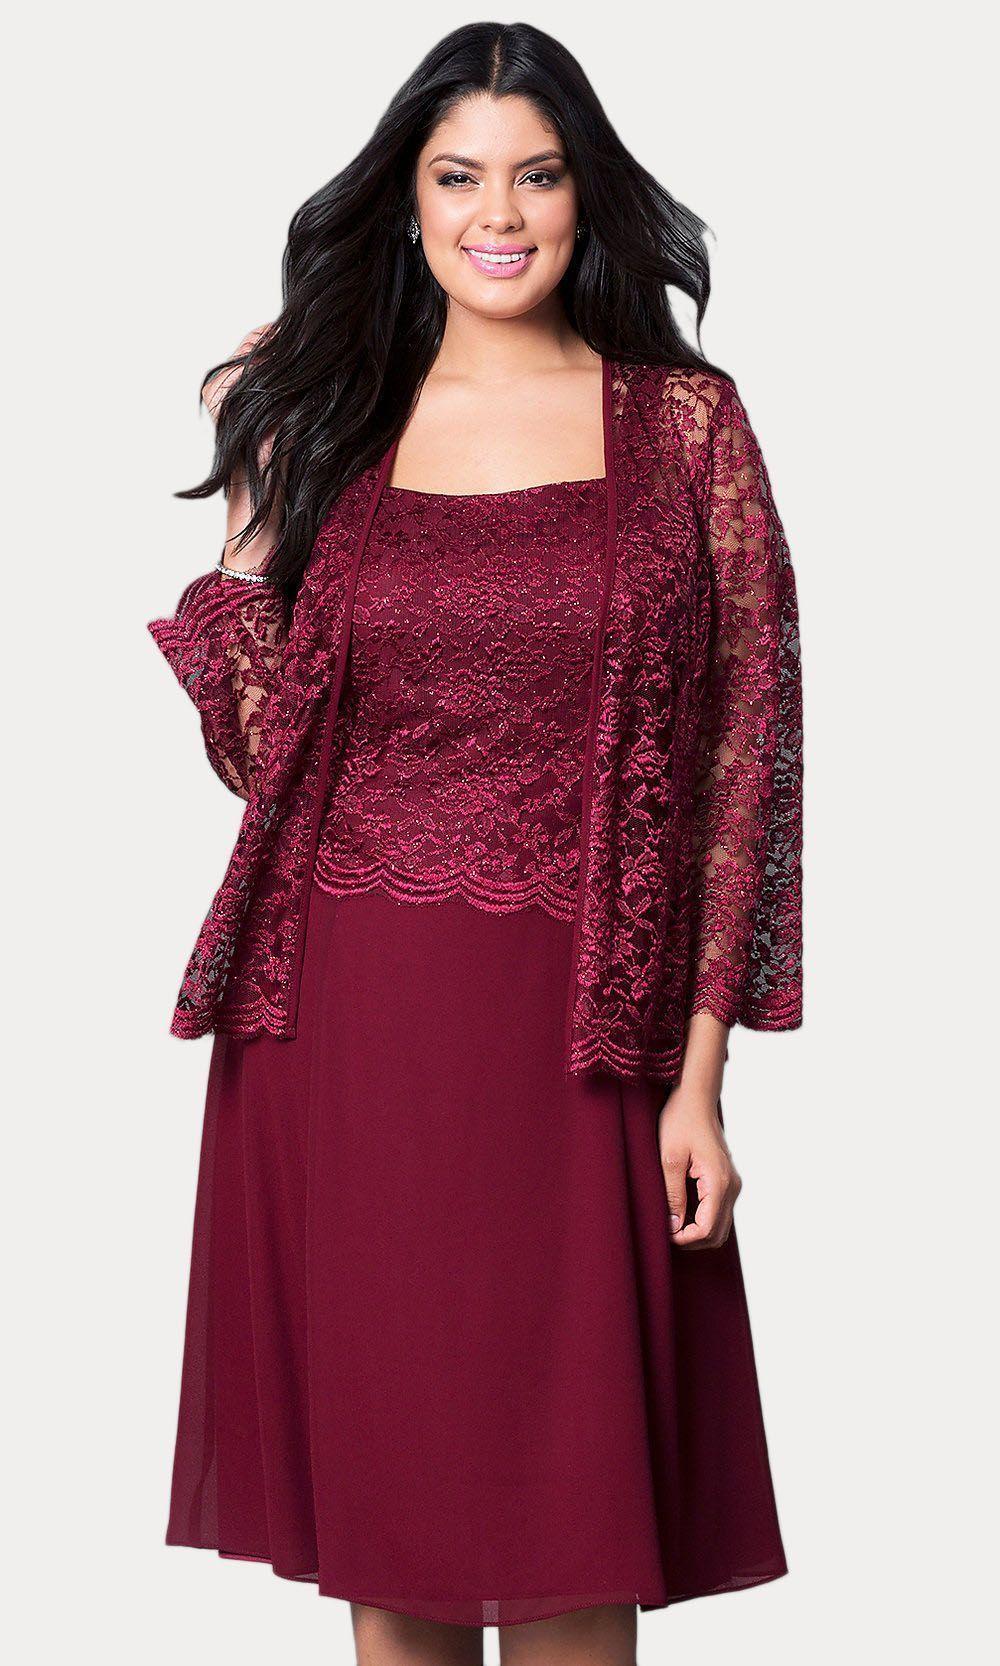 635bd65ae2e5 Short Silver Mother of Groom Dress Chiffon Knee Length Lace Jacket –  DiscountDressShop